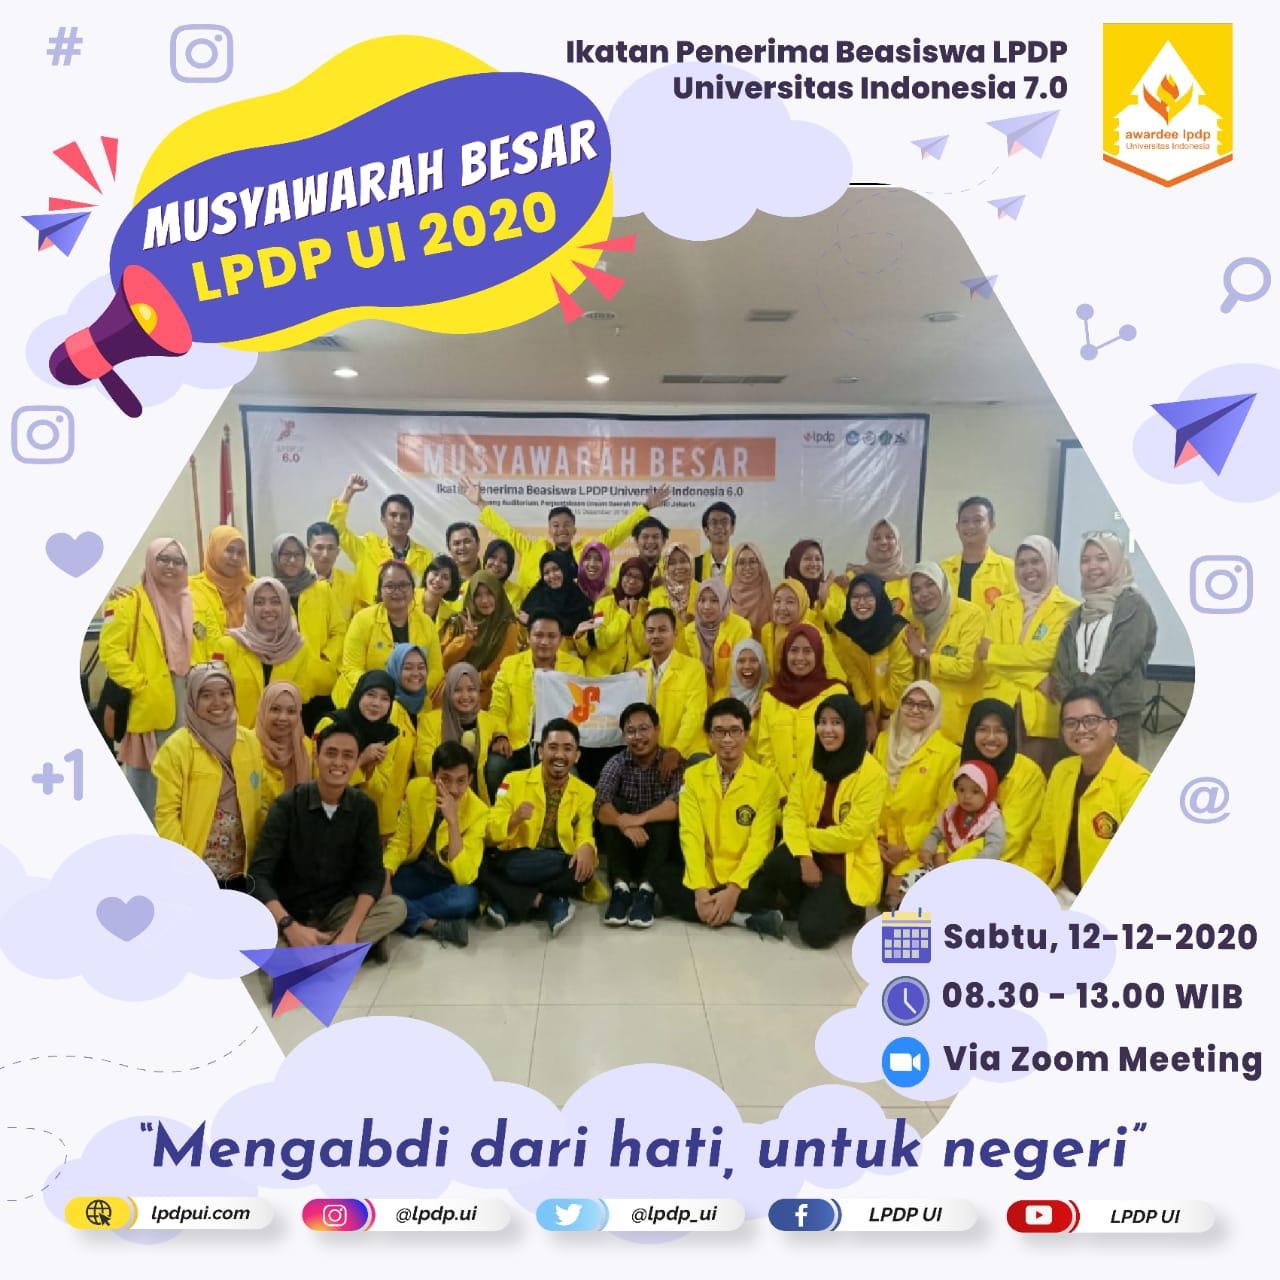 Open Recruitment Panitia Musyawarah Besar dan KPU LPDP UI 2020 (Virtual)